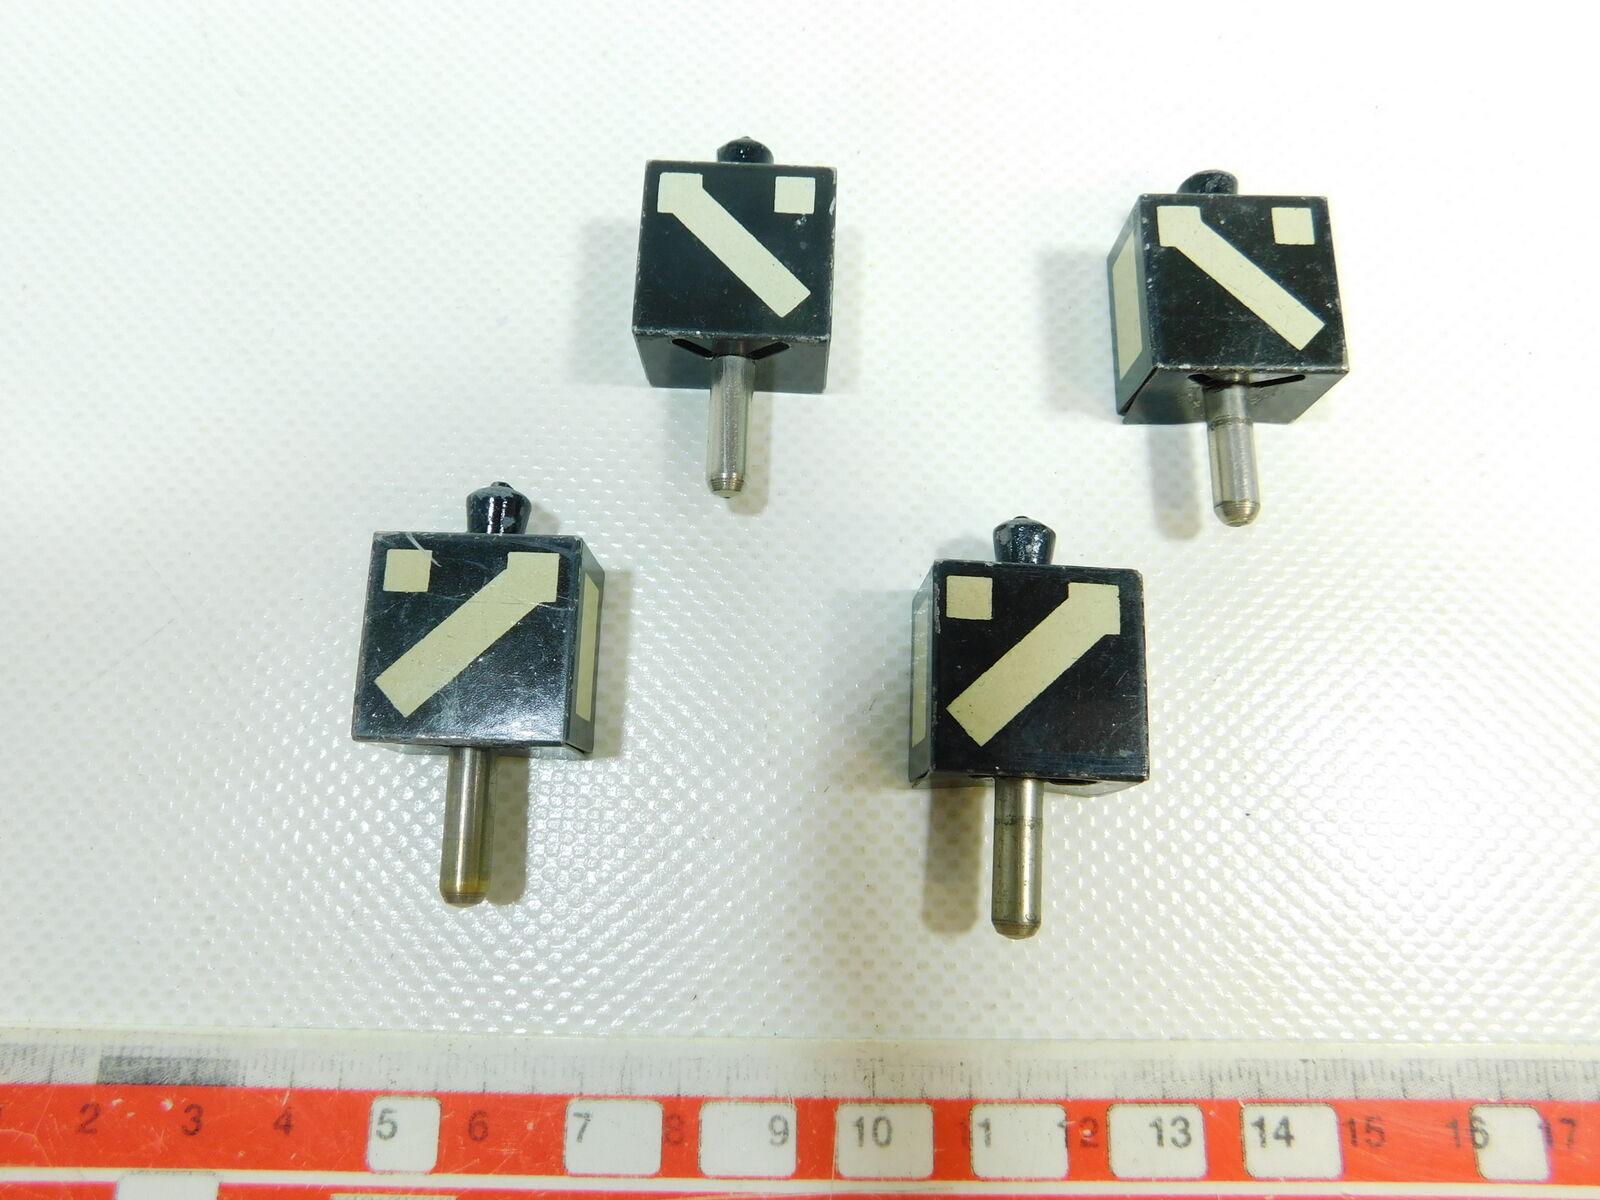 BR896-0,5x Märklin Spur 0 1 Blech-Laternenimitat für Weiche E-Weiche